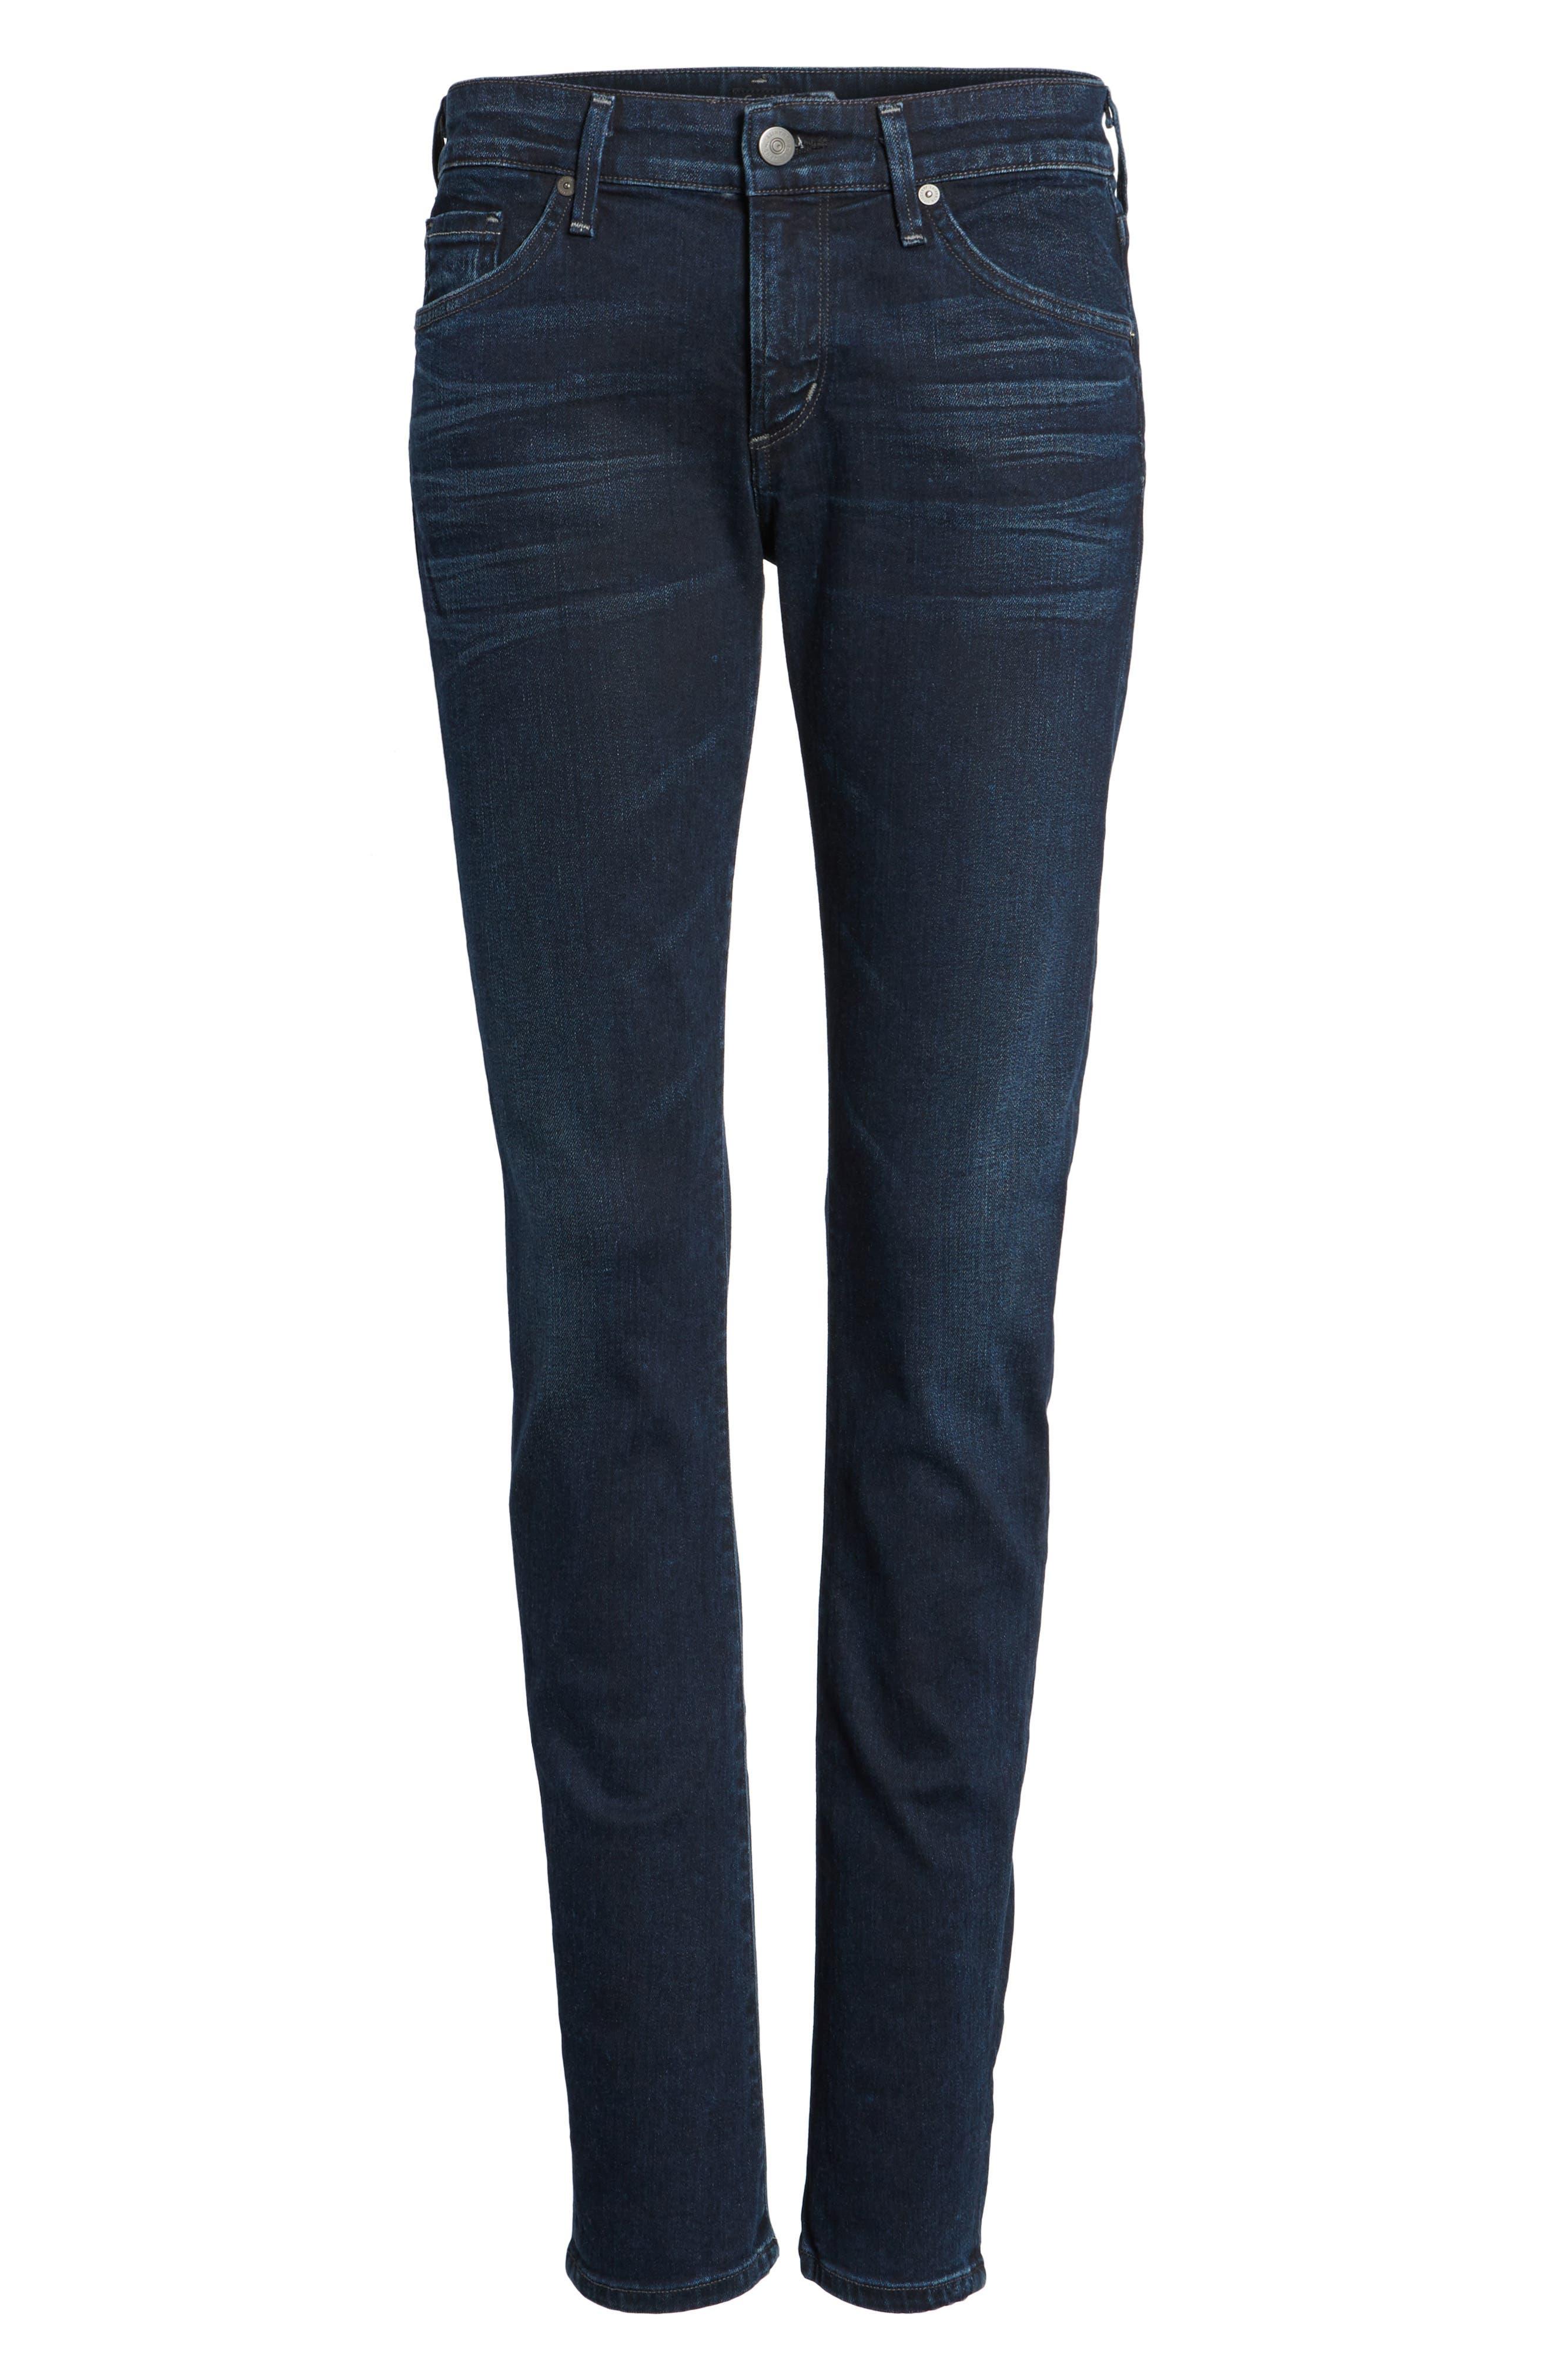 Arielle Skinny Jeans,                             Alternate thumbnail 6, color,                             406